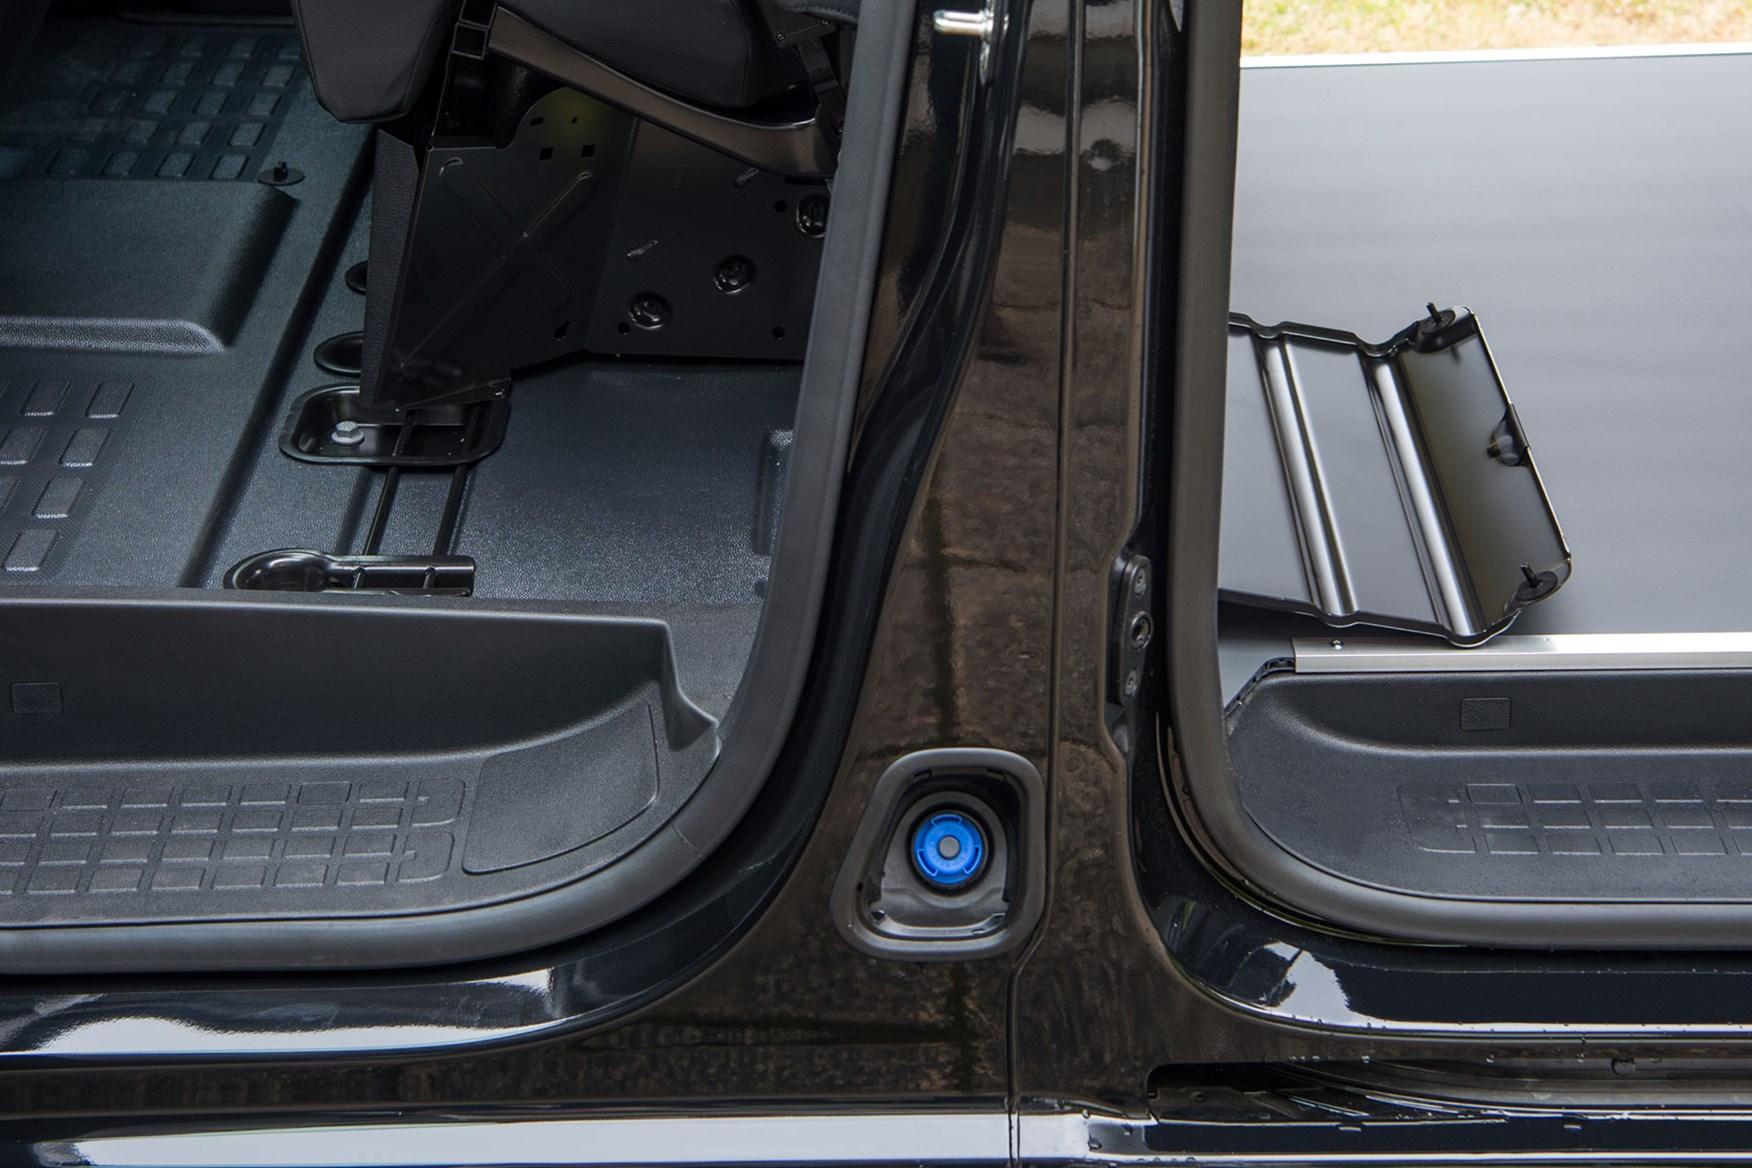 Vauxhall Vivaro FlexCargo load-through bulkhead, side view